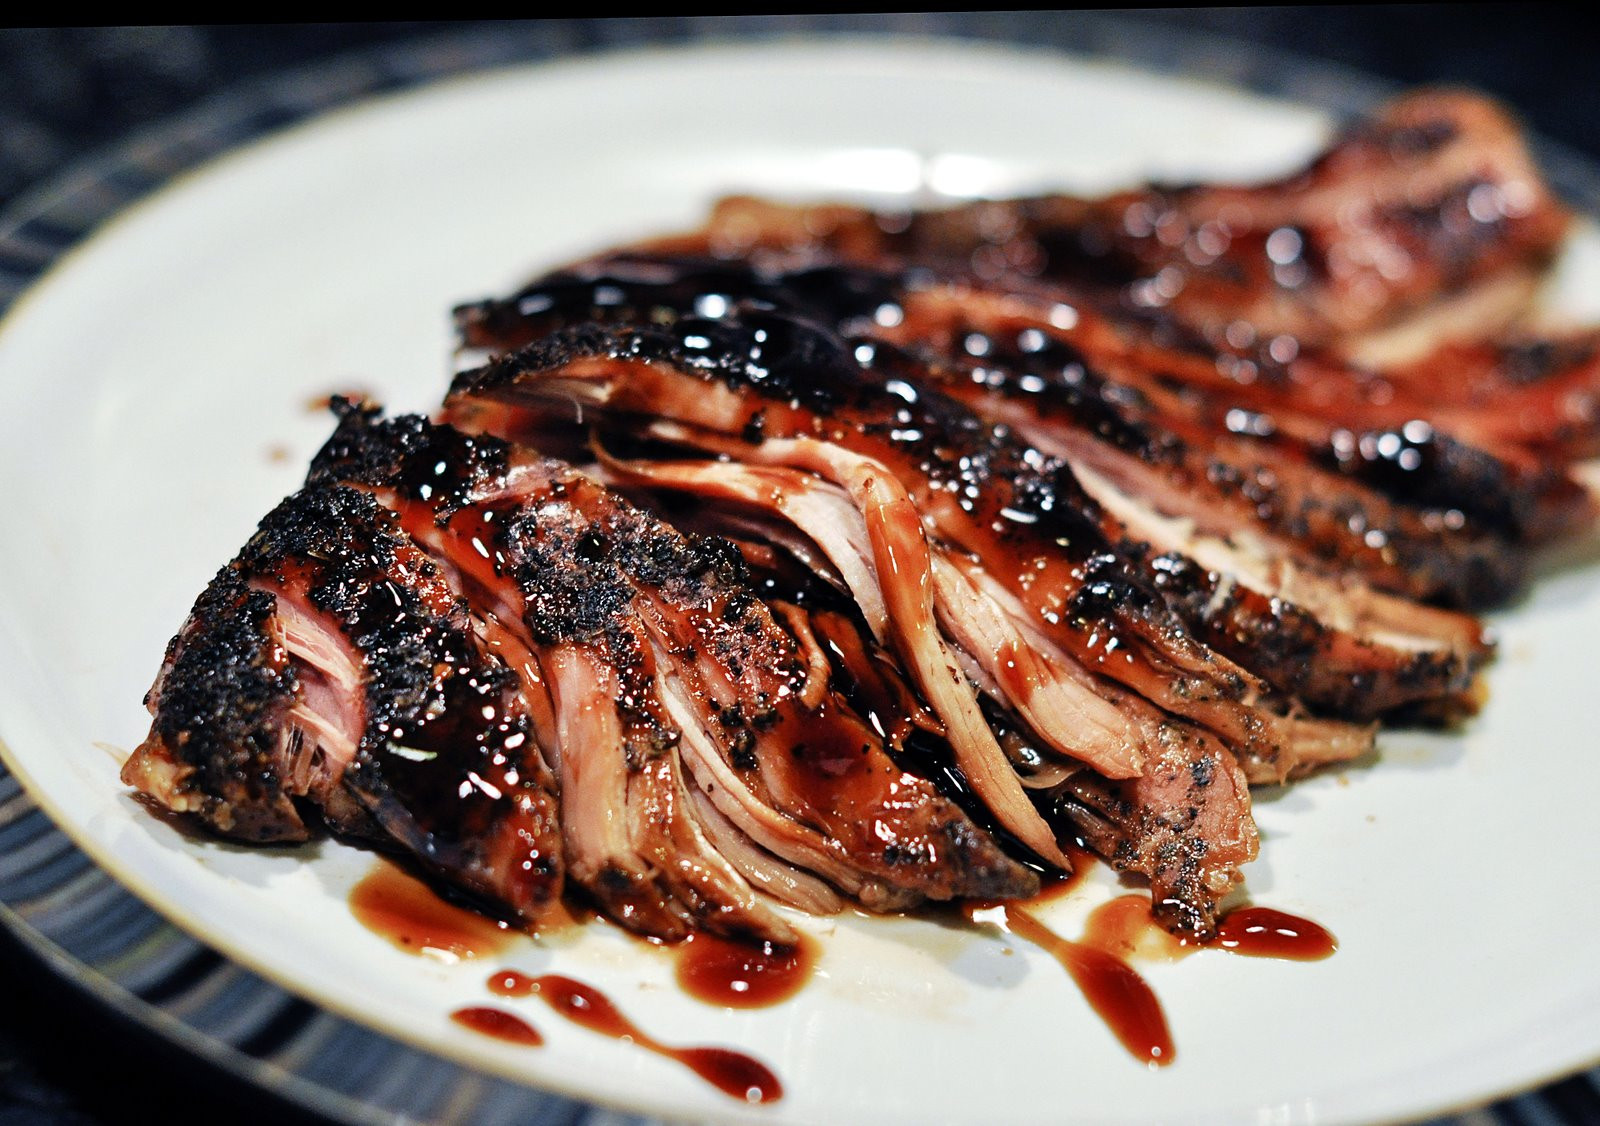 Pork Loin Crock Pot Recipe  crock pot brown sugar and balsamic glazed pork loin